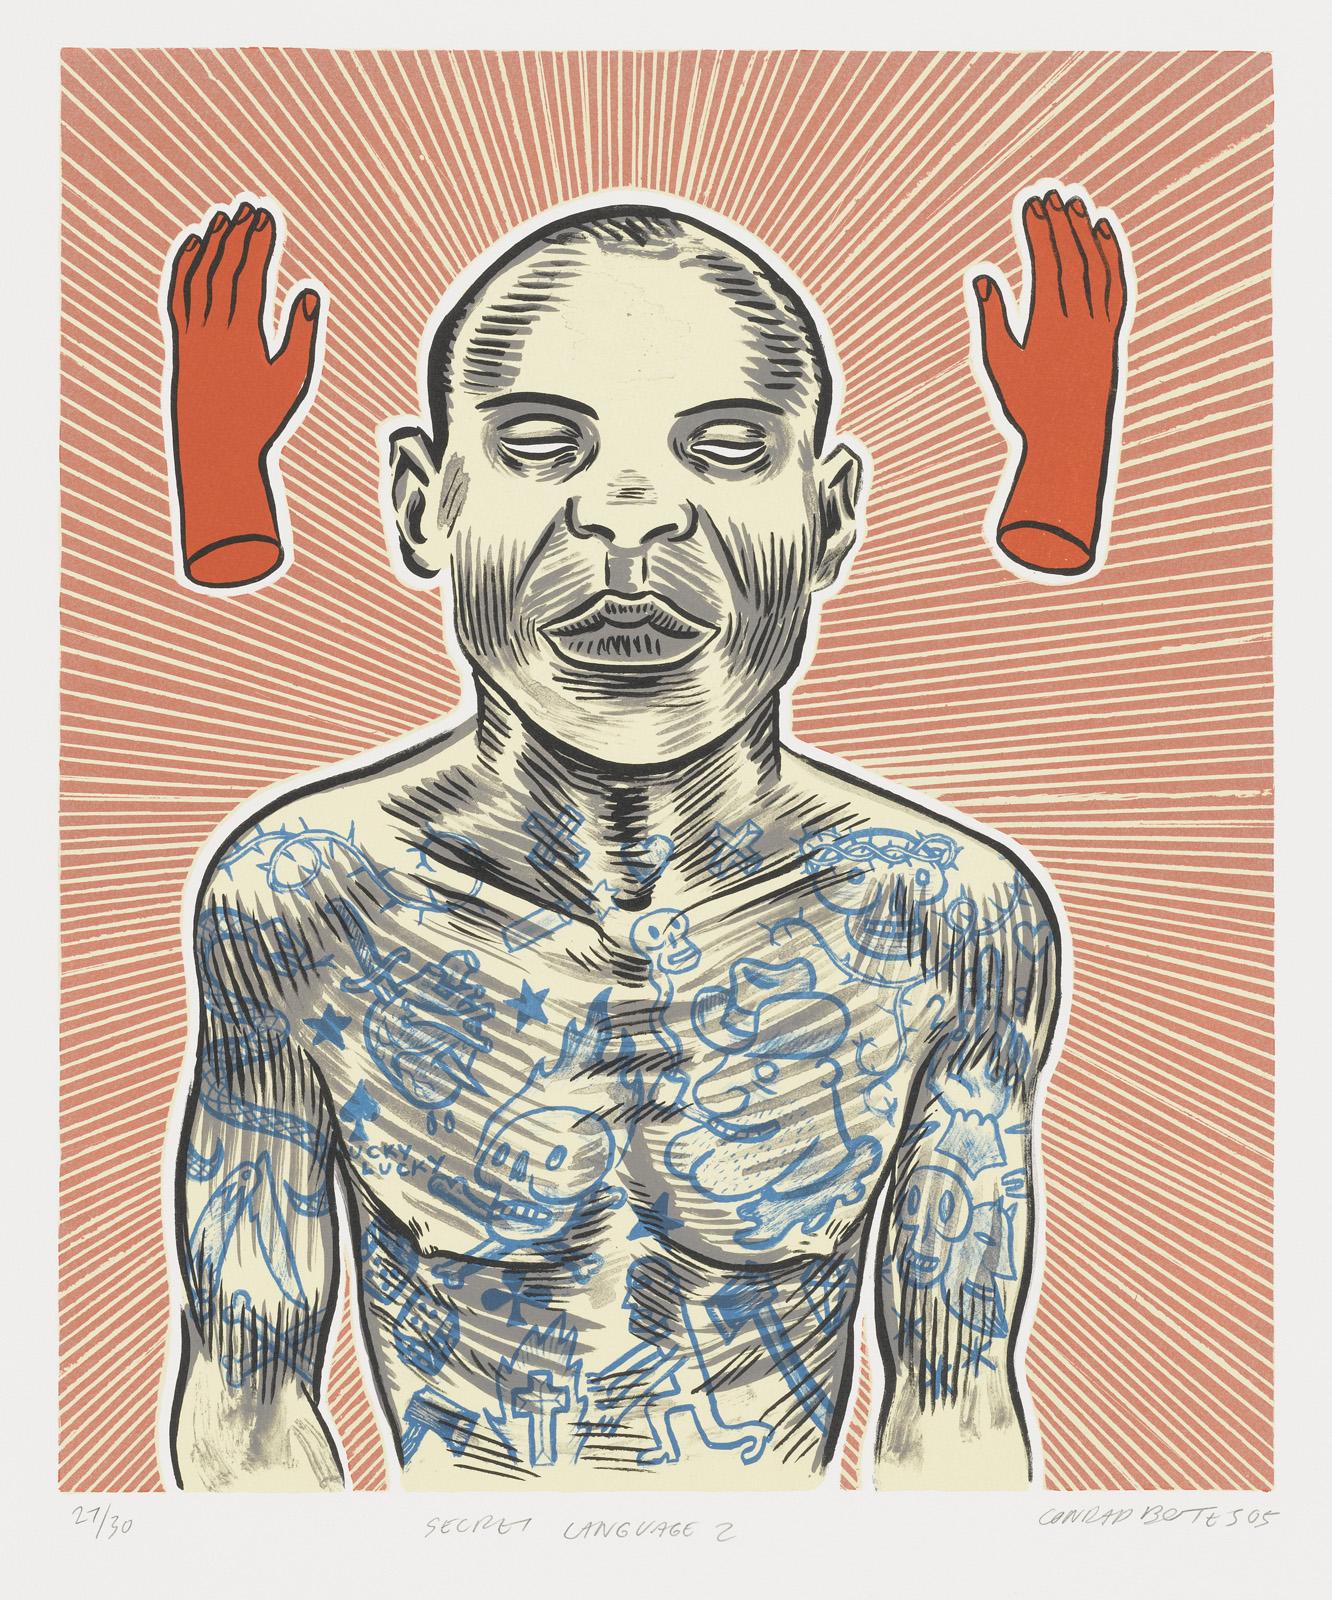 "Conrad Botes (South African, born 1969). <i>Secret Language II</i>. 2005 Lithograph, composition: 17 11/16"" x 14 15/16"". Image courtesy MoMA."